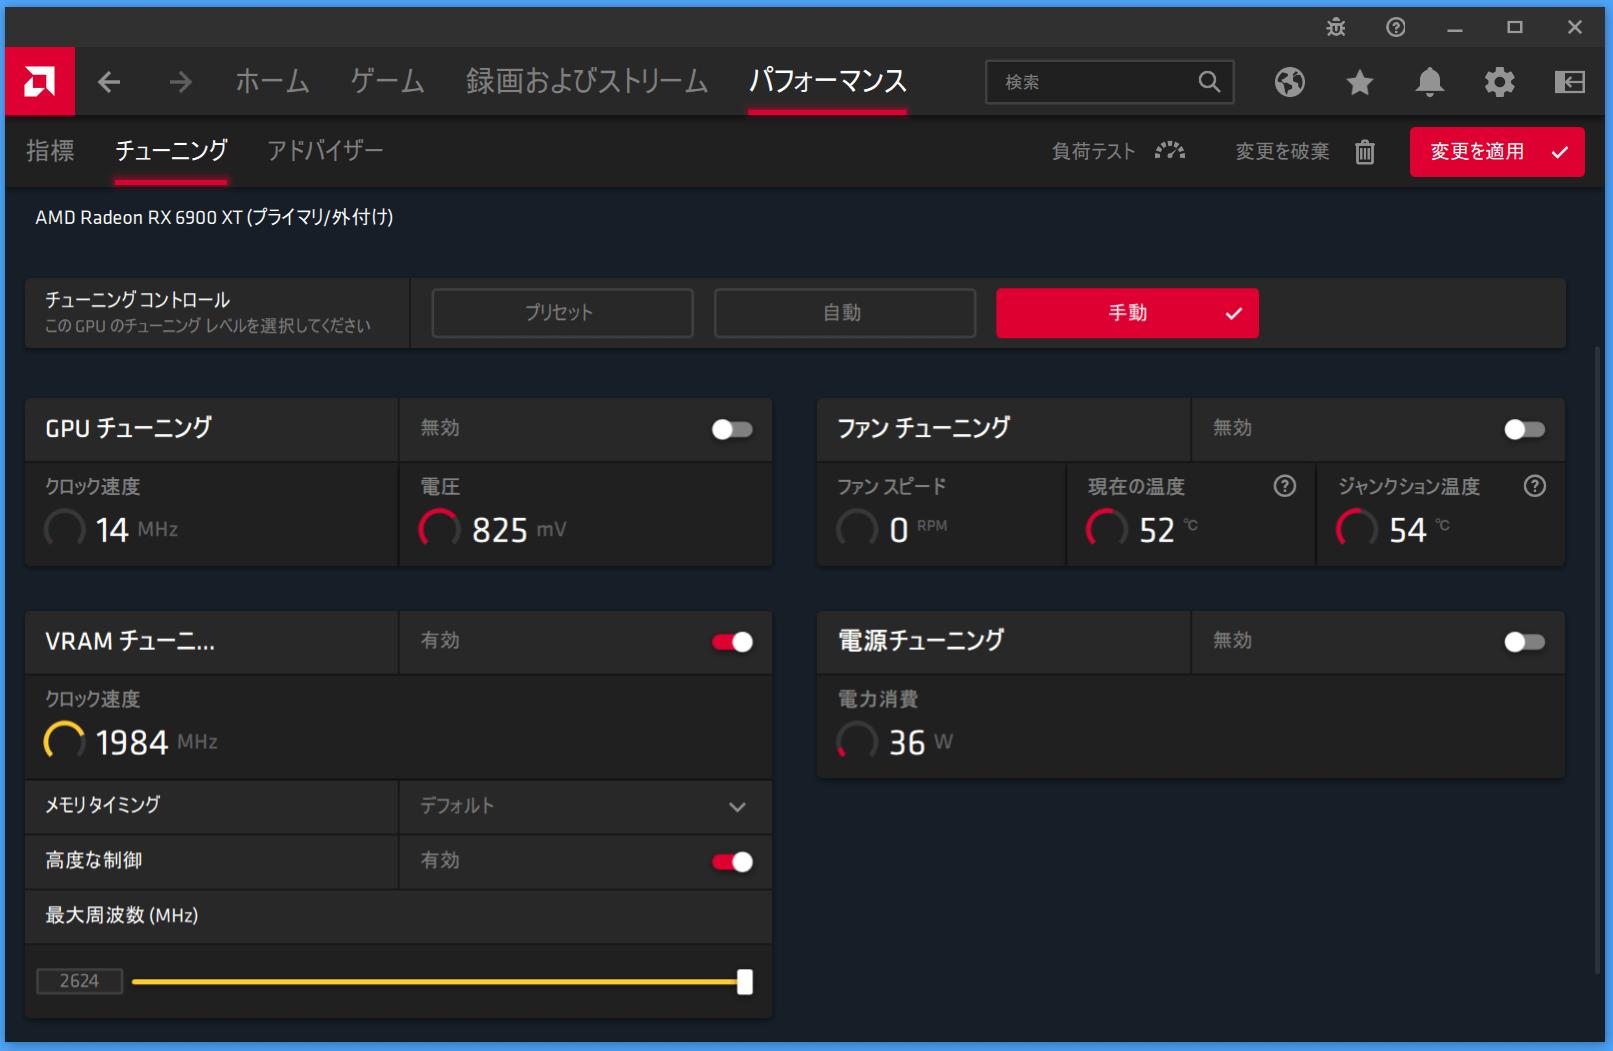 Radeon RX 6900 XT_Navi 21 XTXH_VRAM-OC-upto-2600MHz